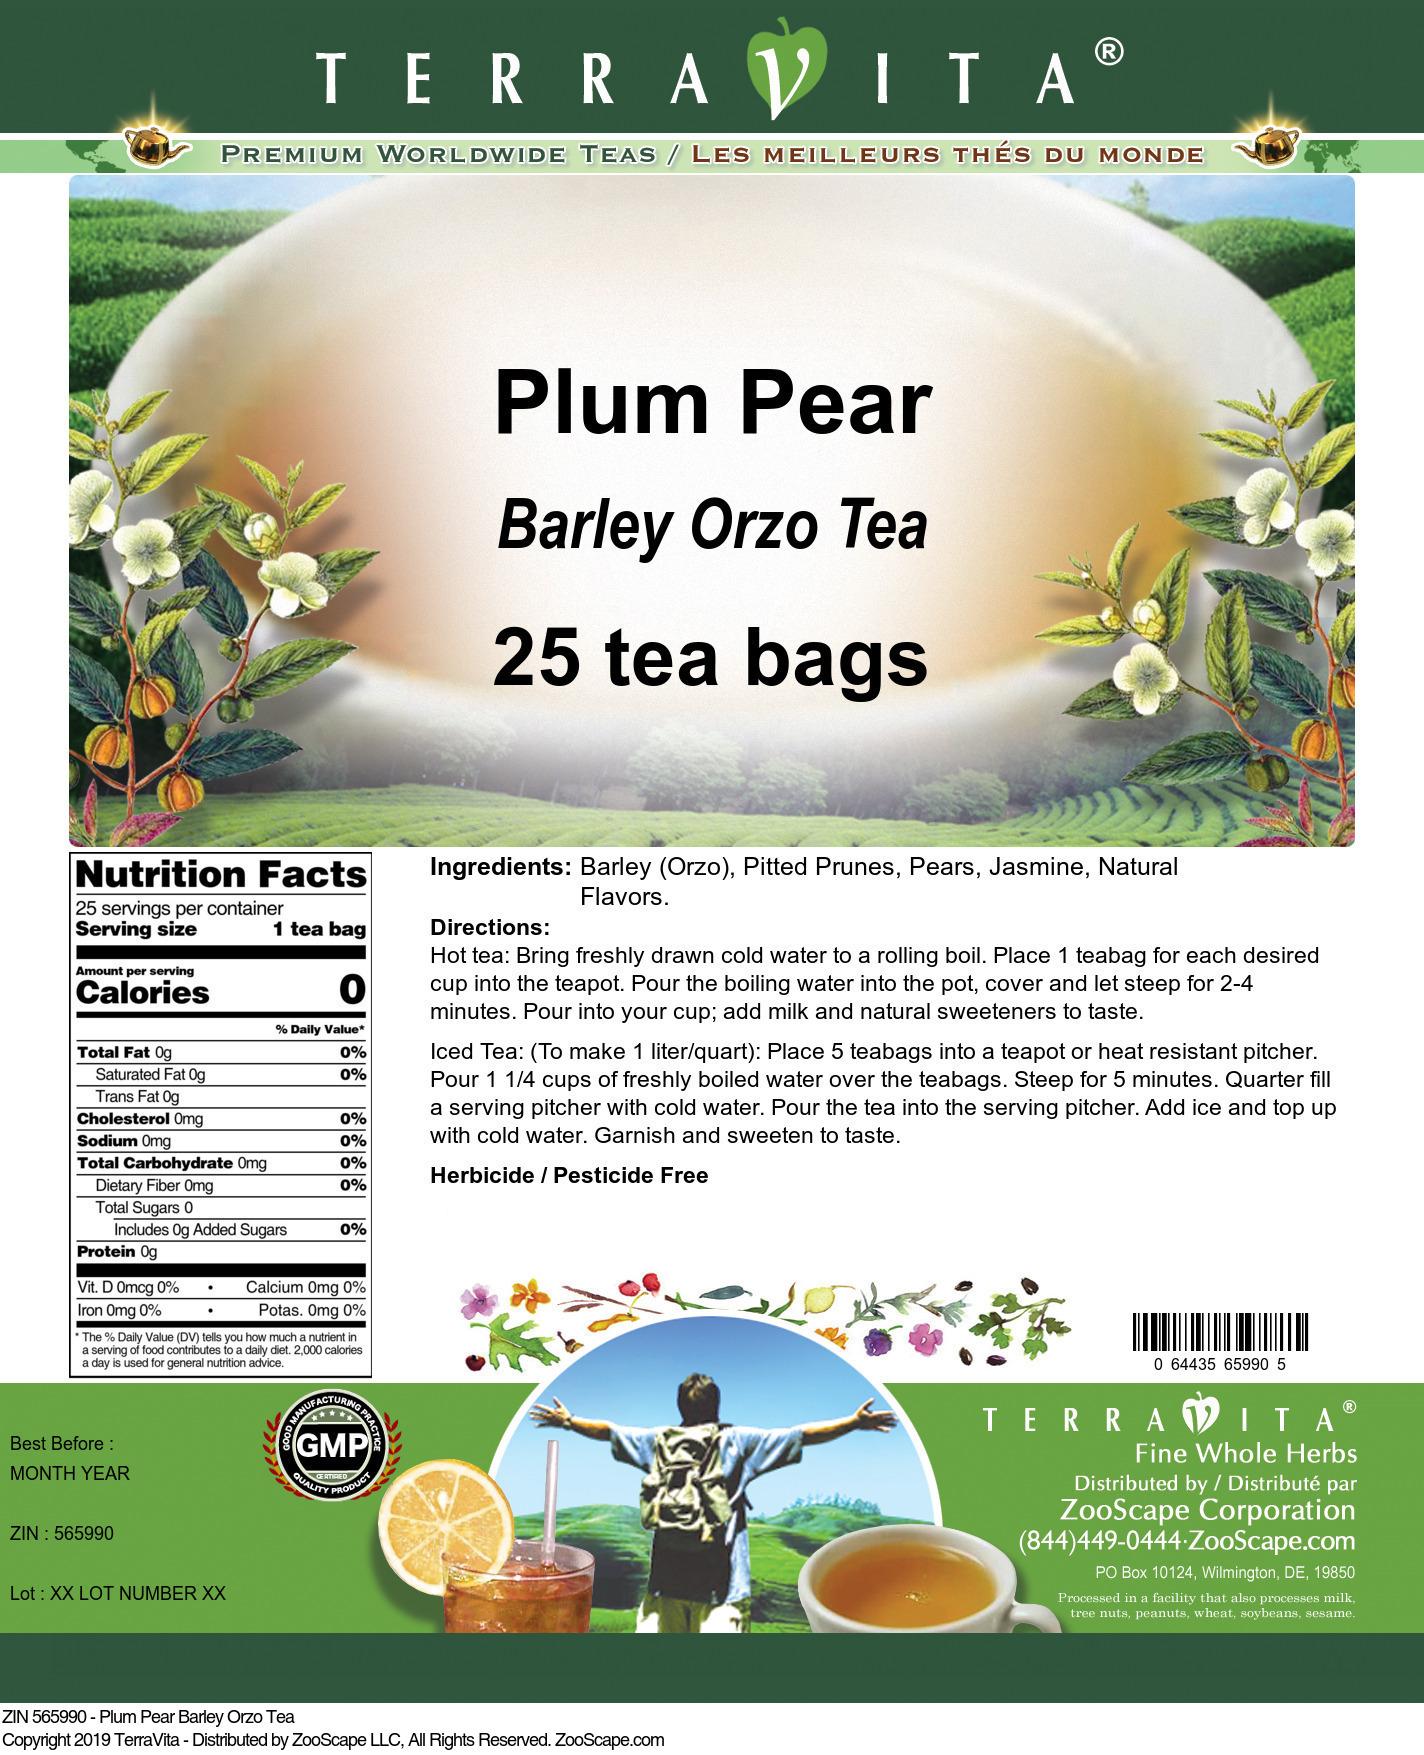 Plum Pear Barley Orzo